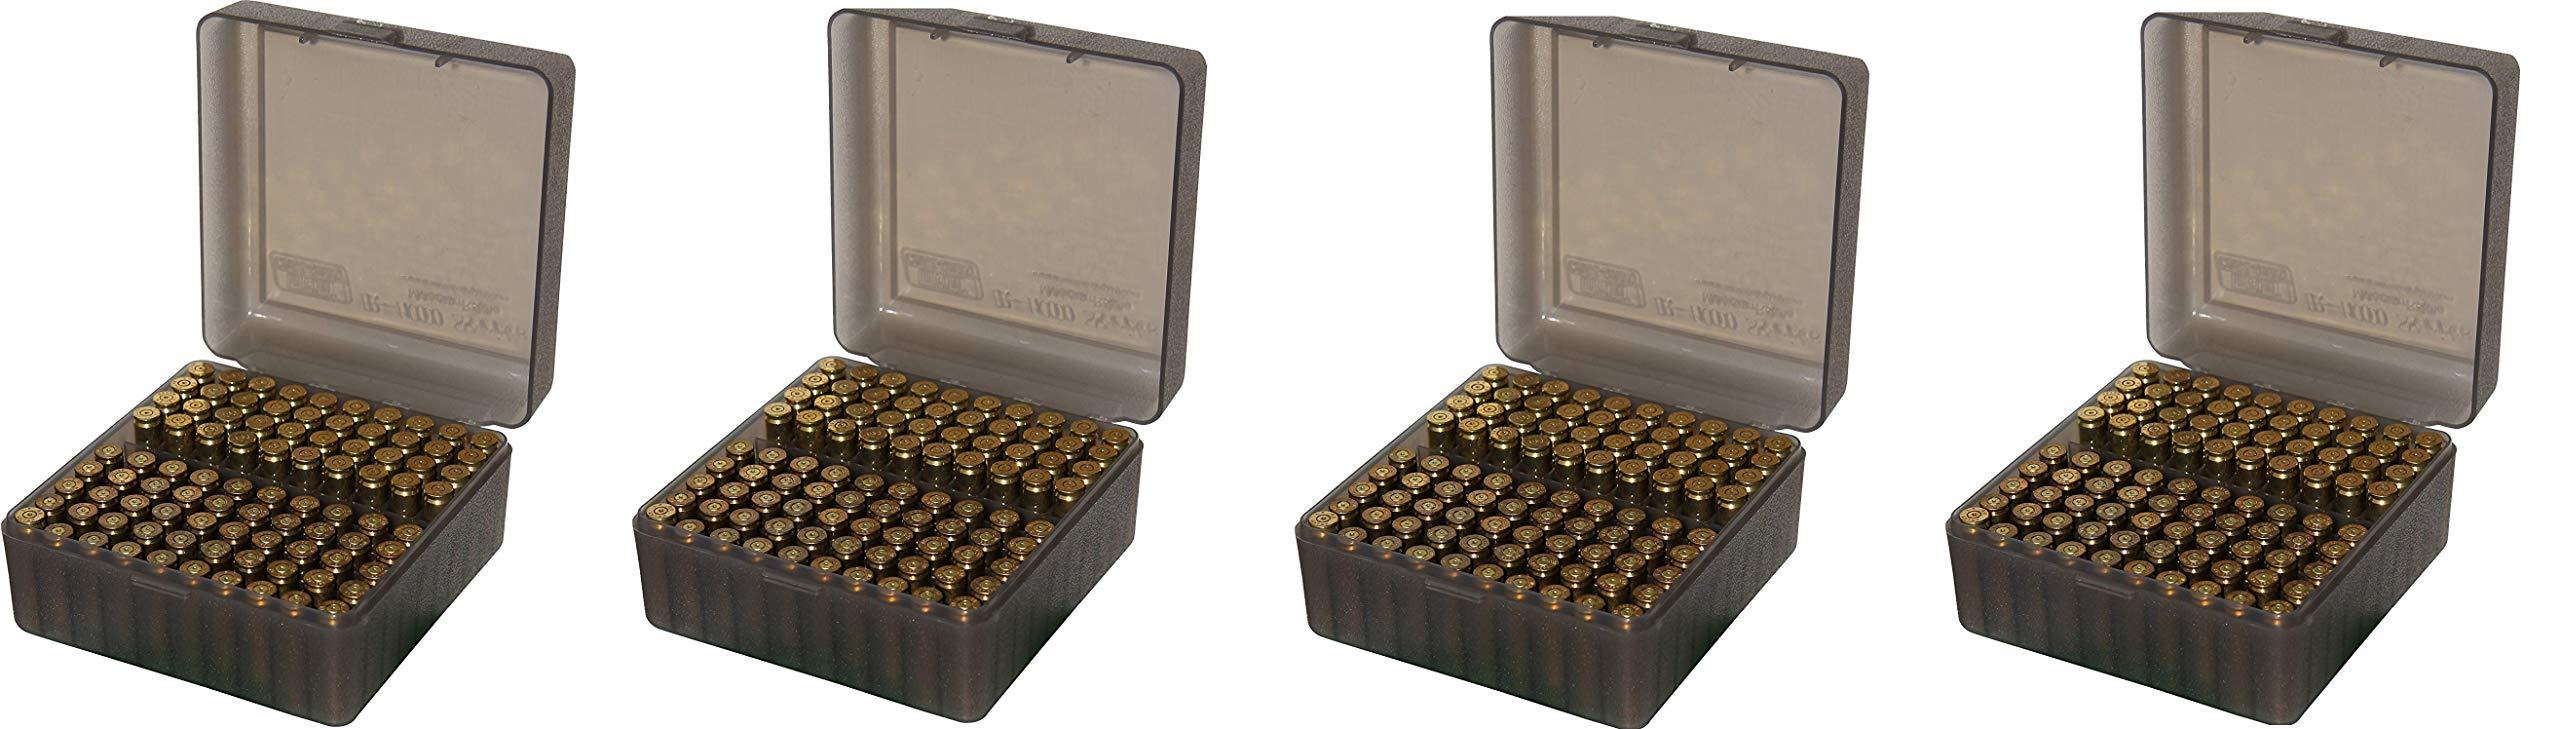 MTM 100 Round Flip-Top Rifle Ammo Box, Medium, Clear Smoke (Pack of 4)